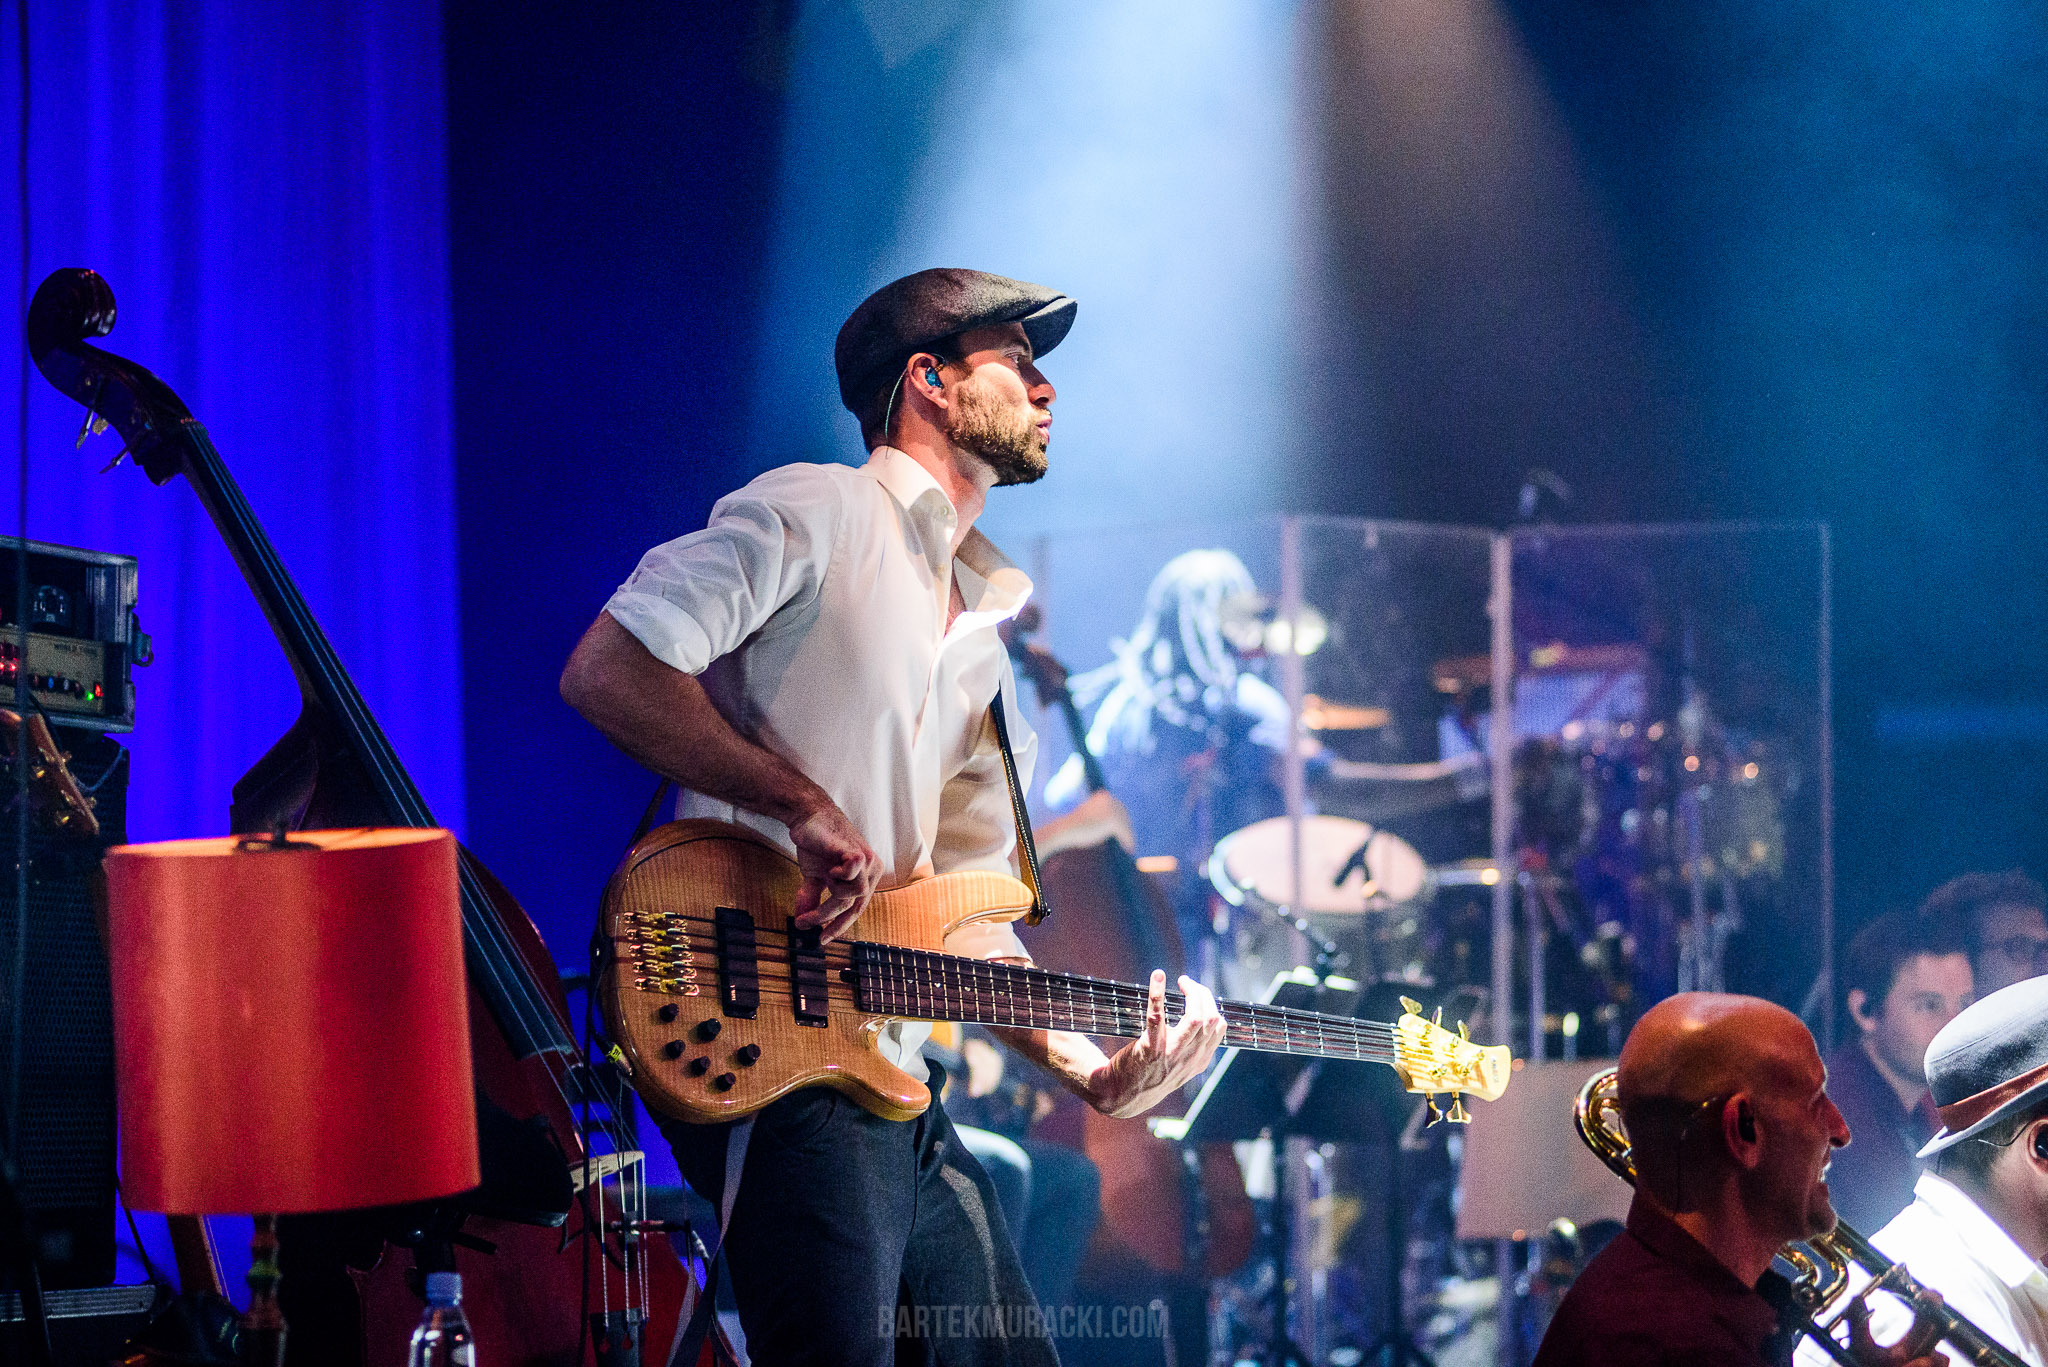 Gentleman-MTV-Unplugged-Spotkania-Kultur-fot-Bartek-Muracki-24-2330